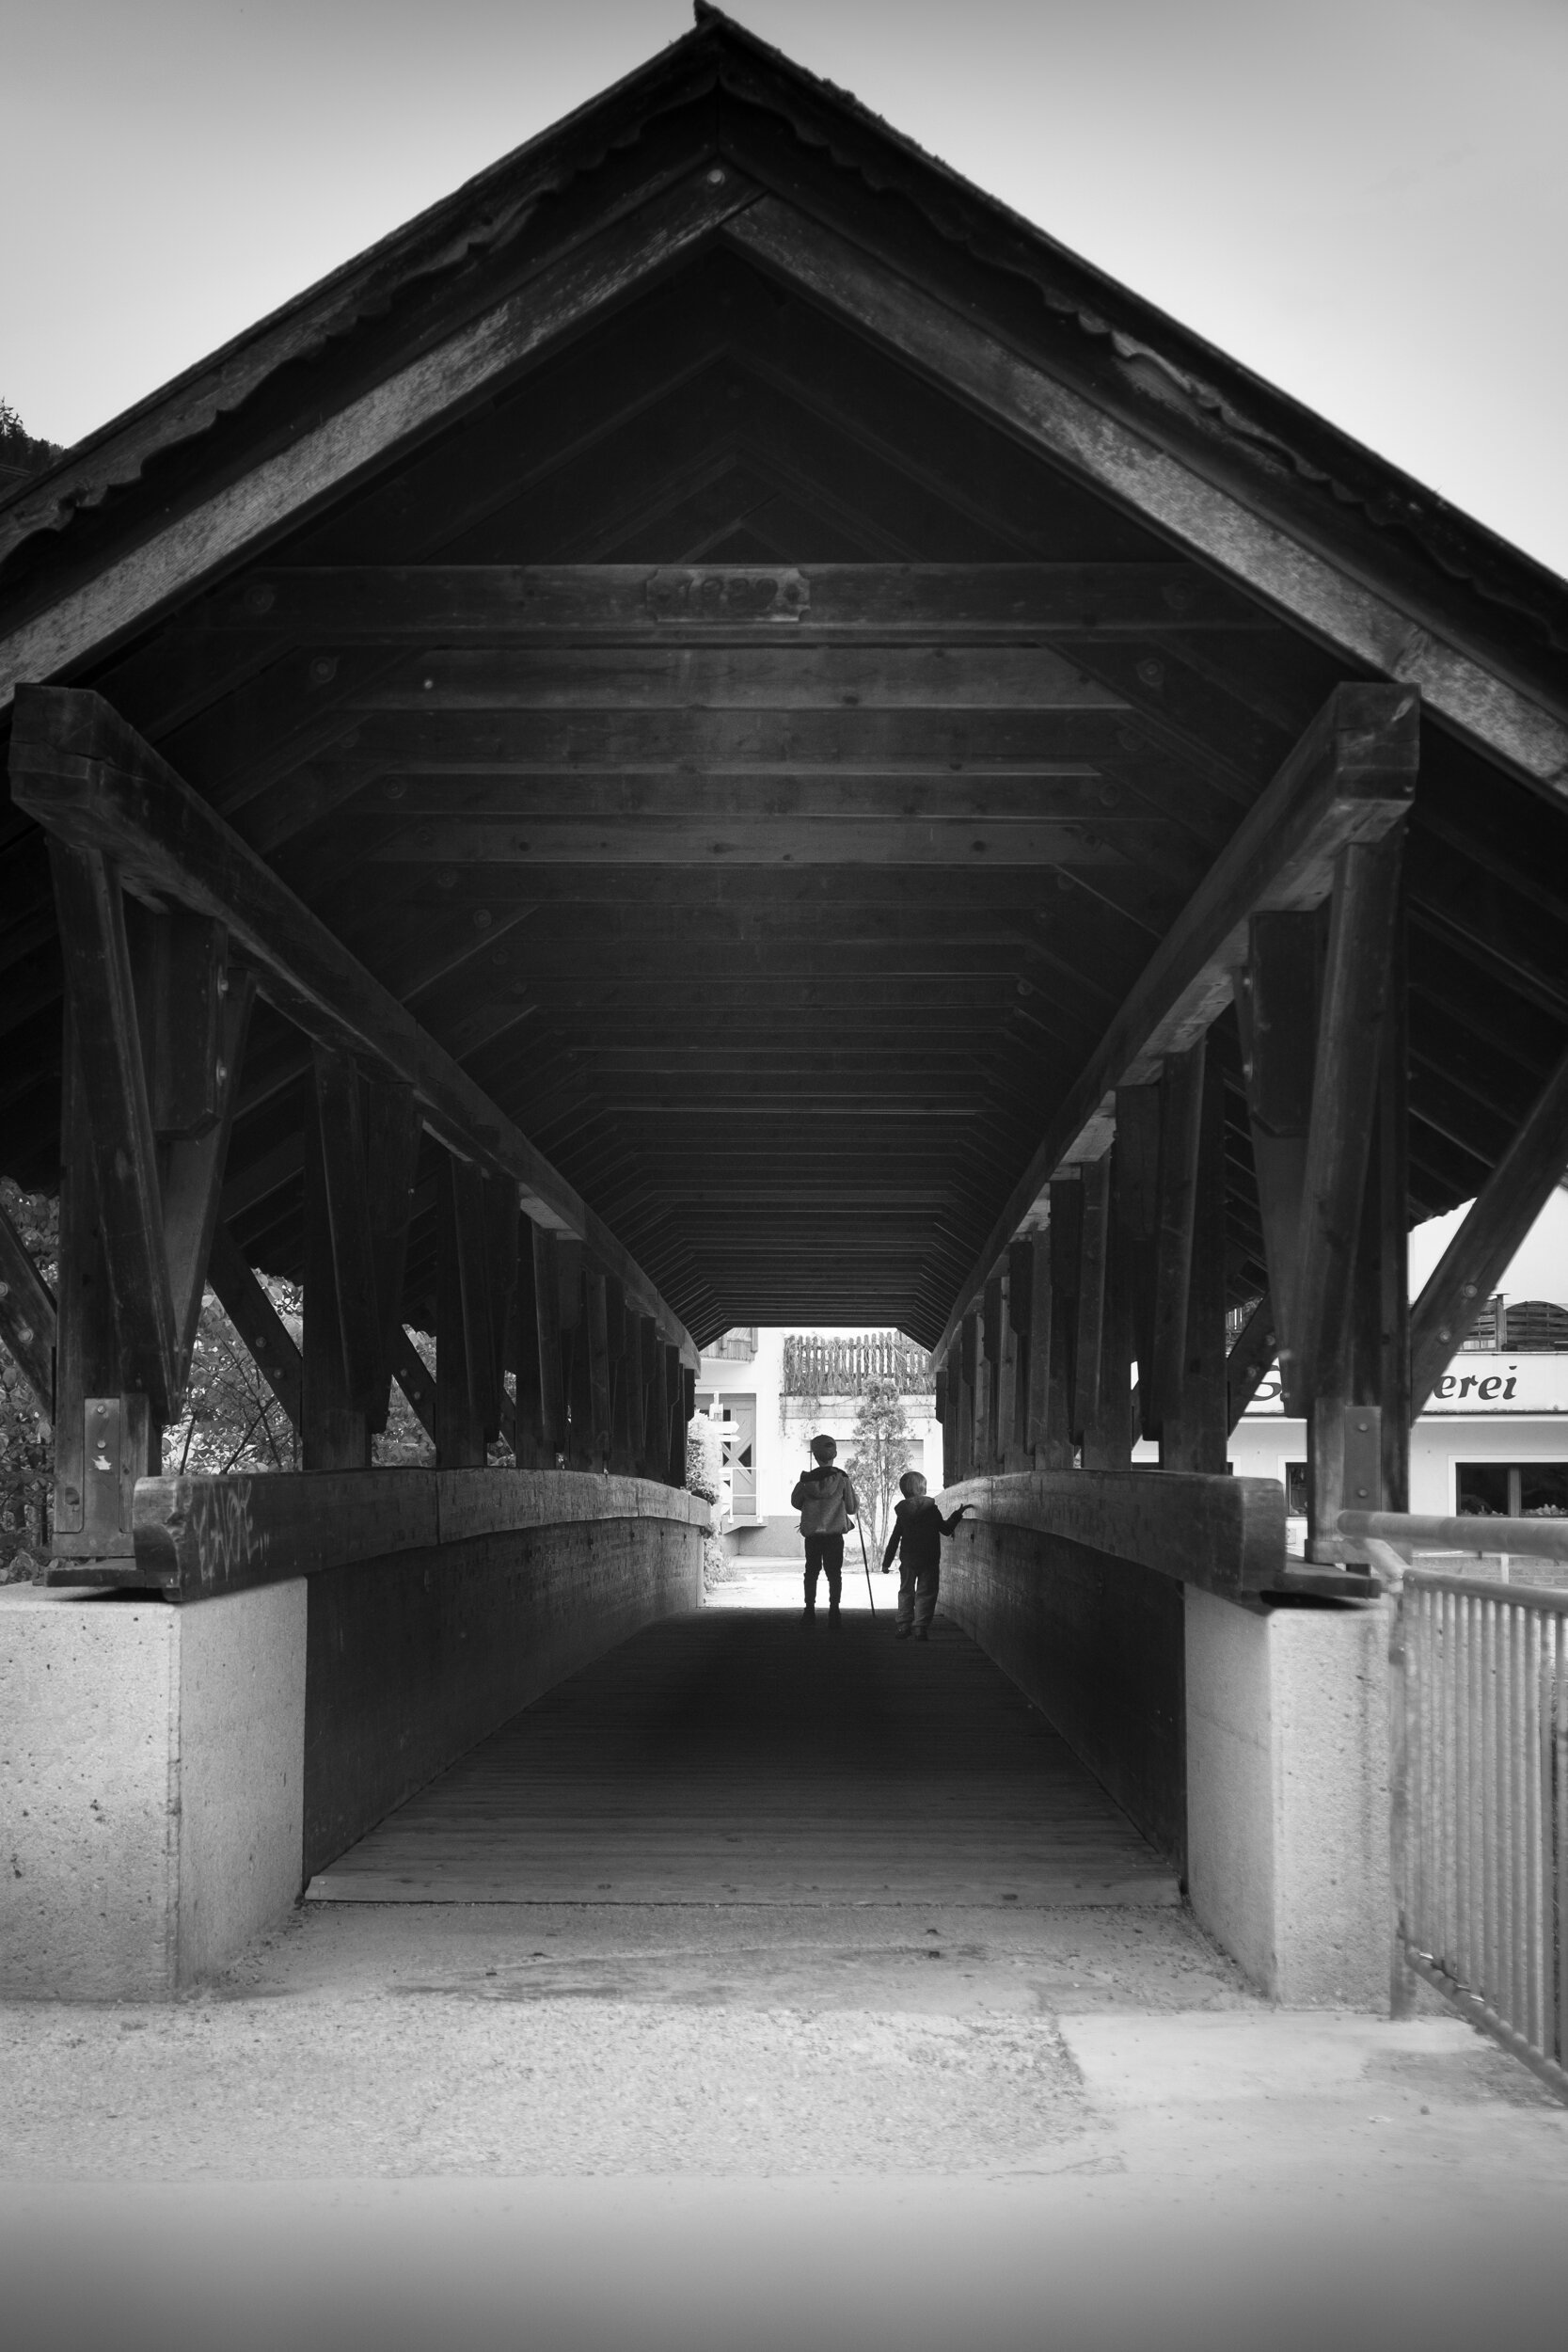 The 'Harry Potter Bridge near the Ahornbahn